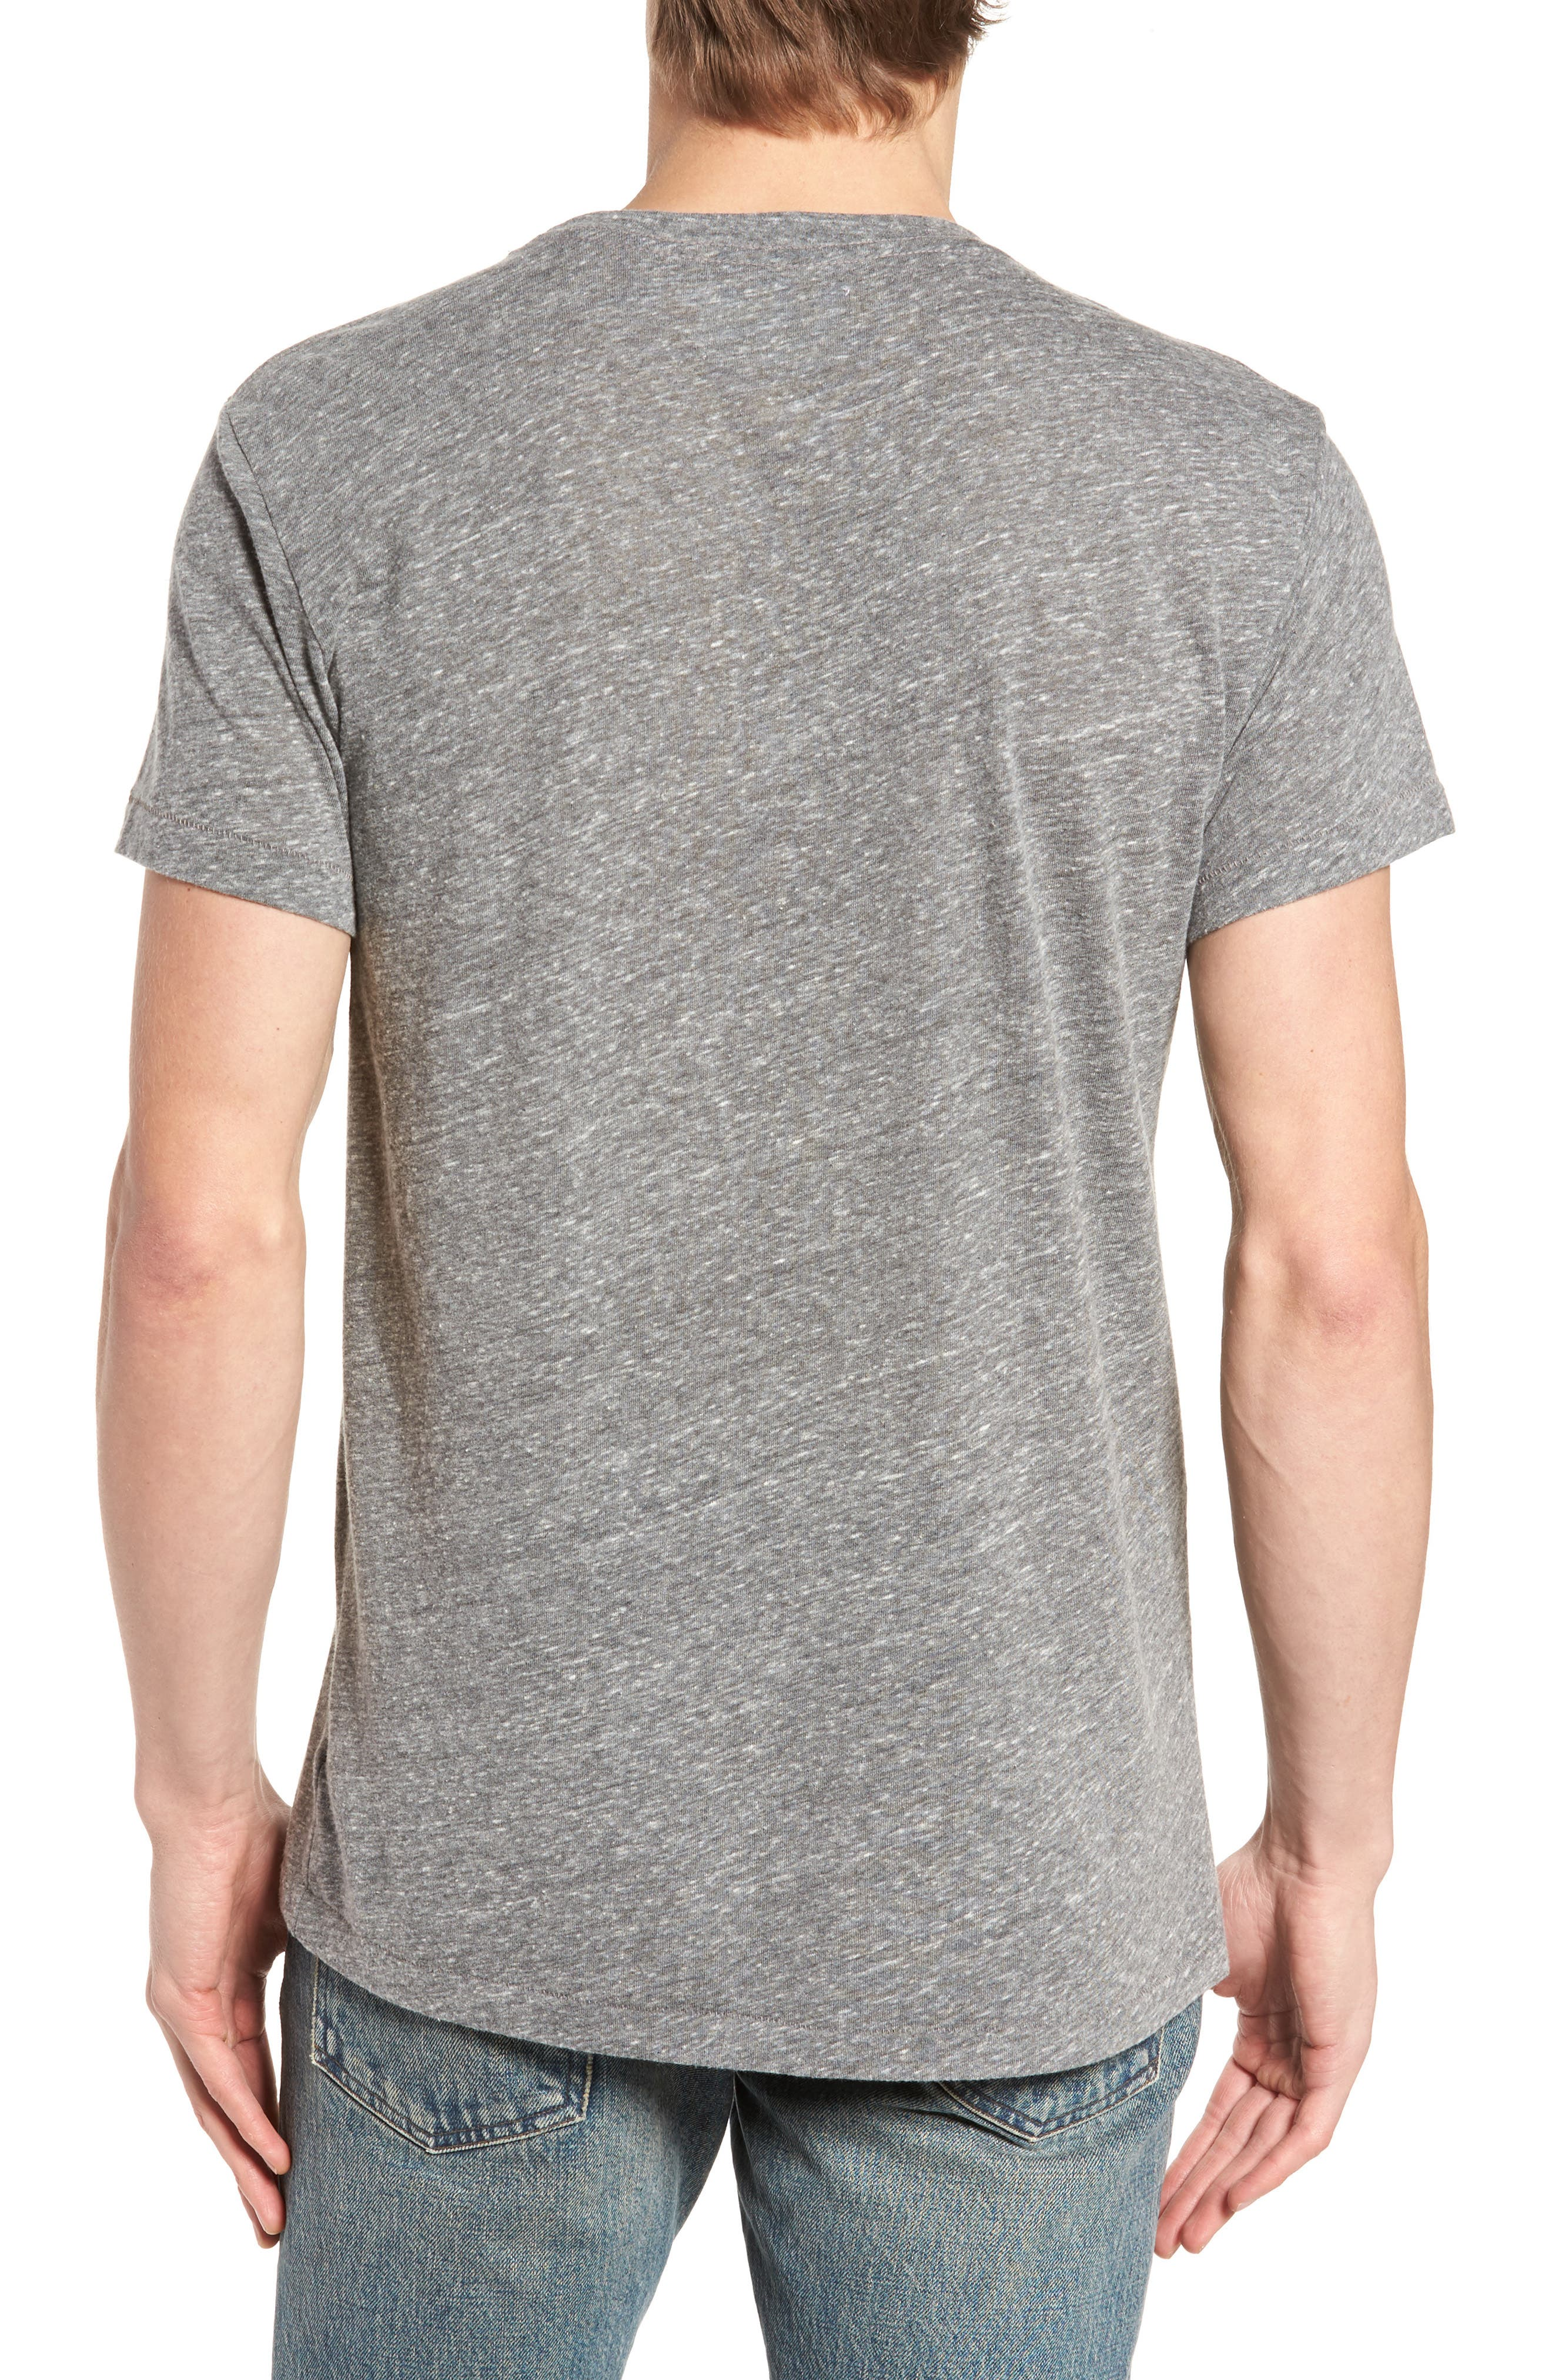 Las Palmas T-Shirt,                             Alternate thumbnail 2, color,                             060